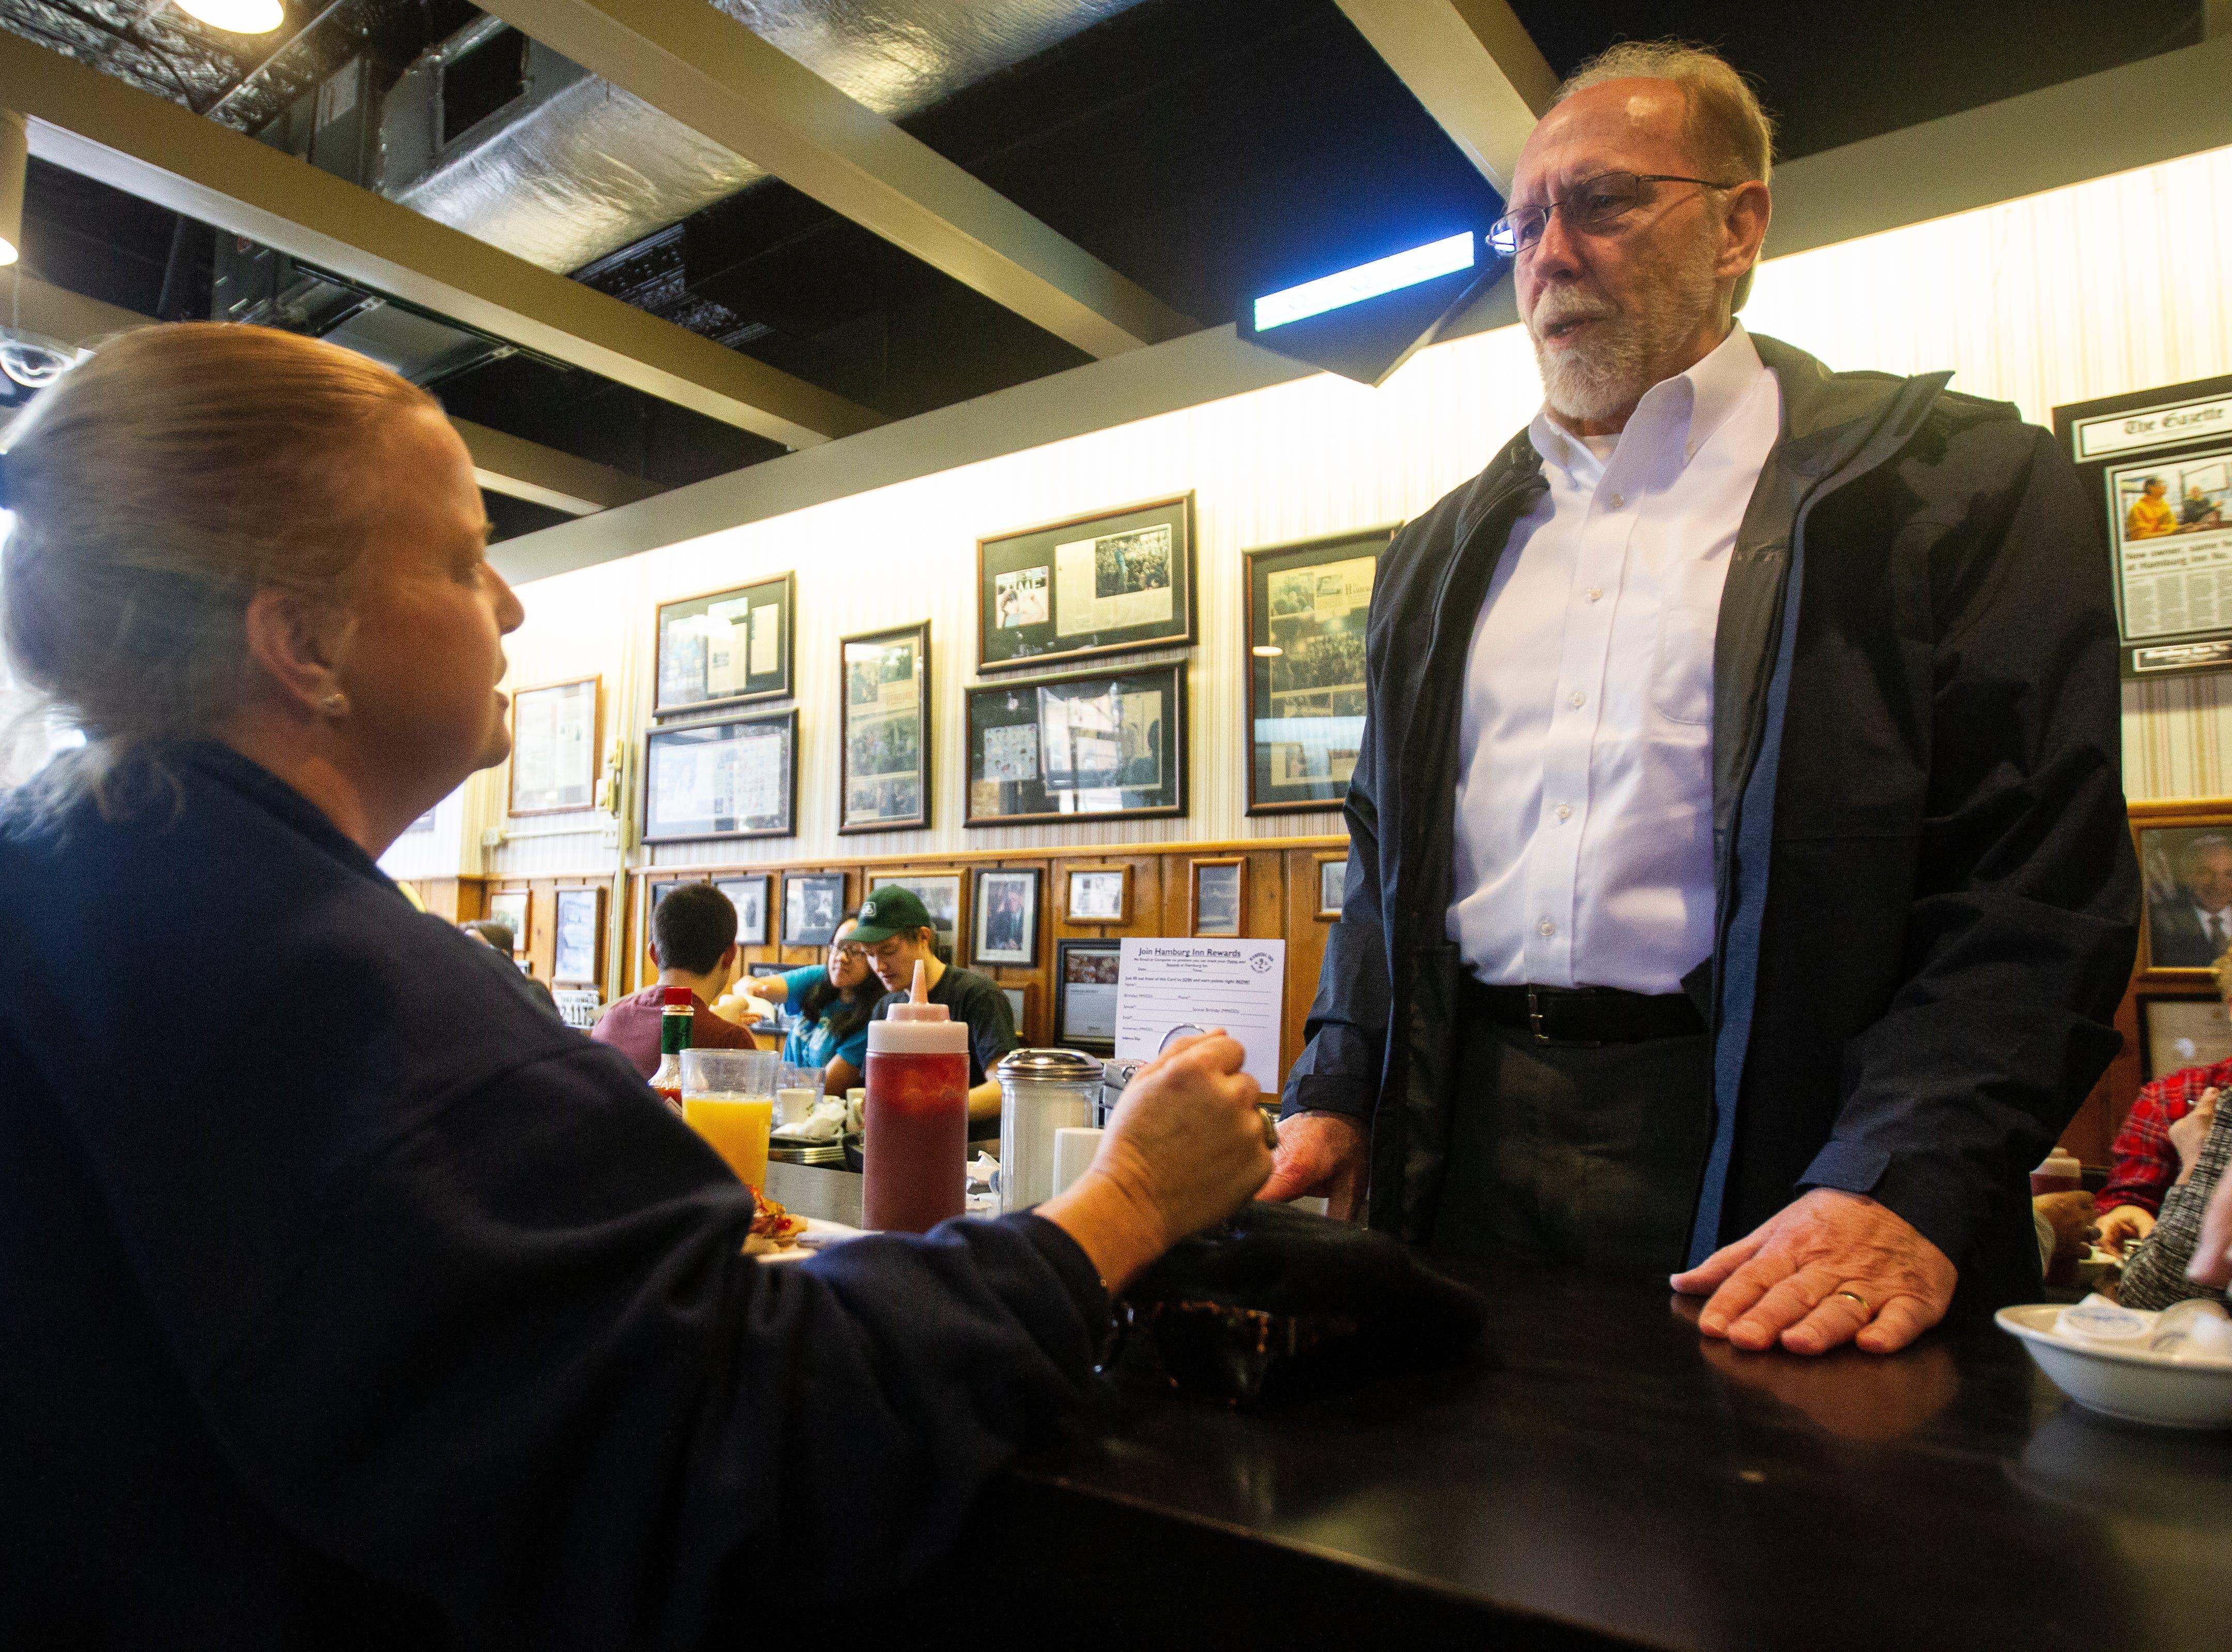 U.S. Rep. Dave Loebsack, D-Iowa, talks with Ara Carbonneau, of Coralville on Thursday morning, Nov. 1, 2018, at Hamburg Inn No. 2 on Linn Street in Iowa City.